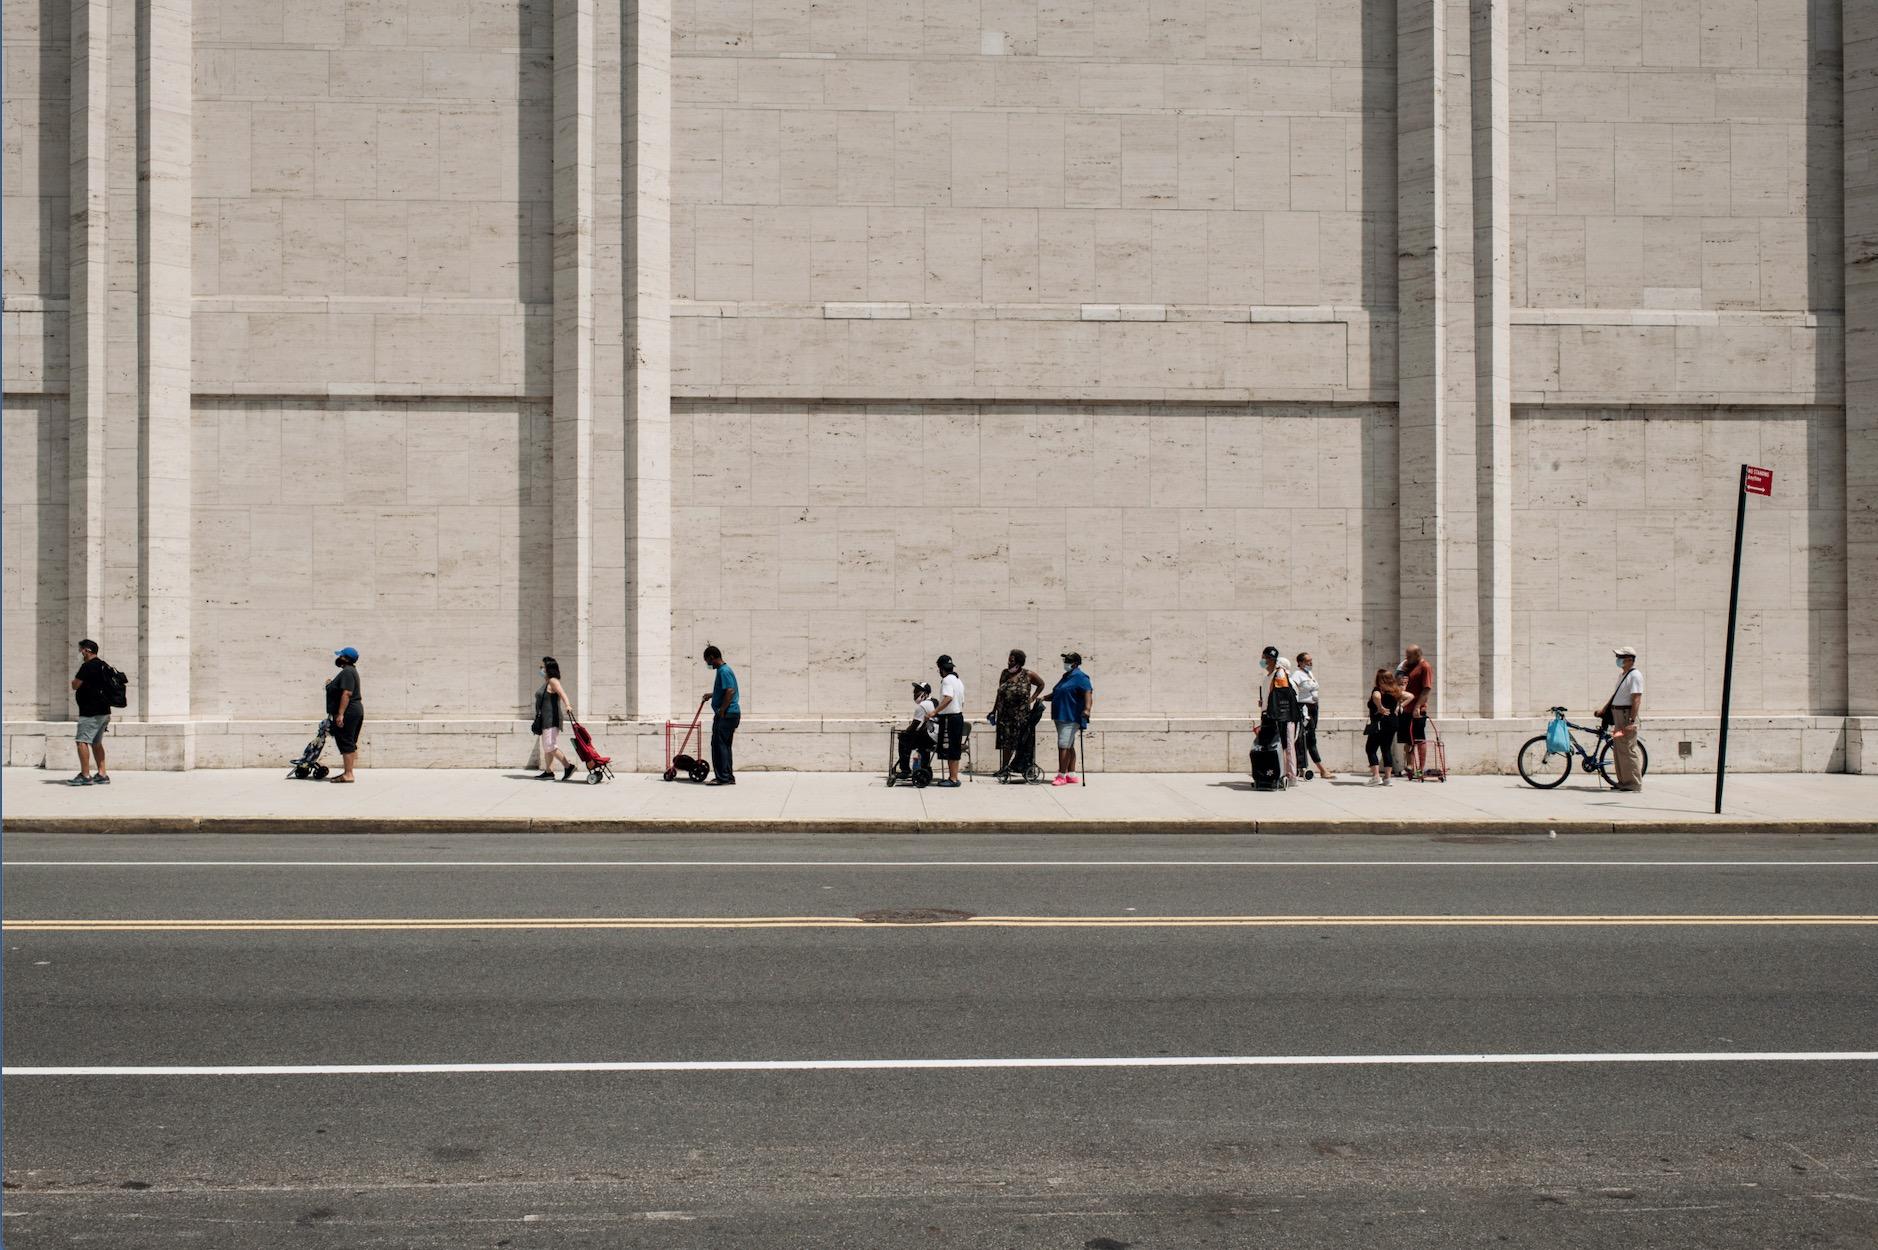 Food Bank Line Scott Heins/Getty Images)